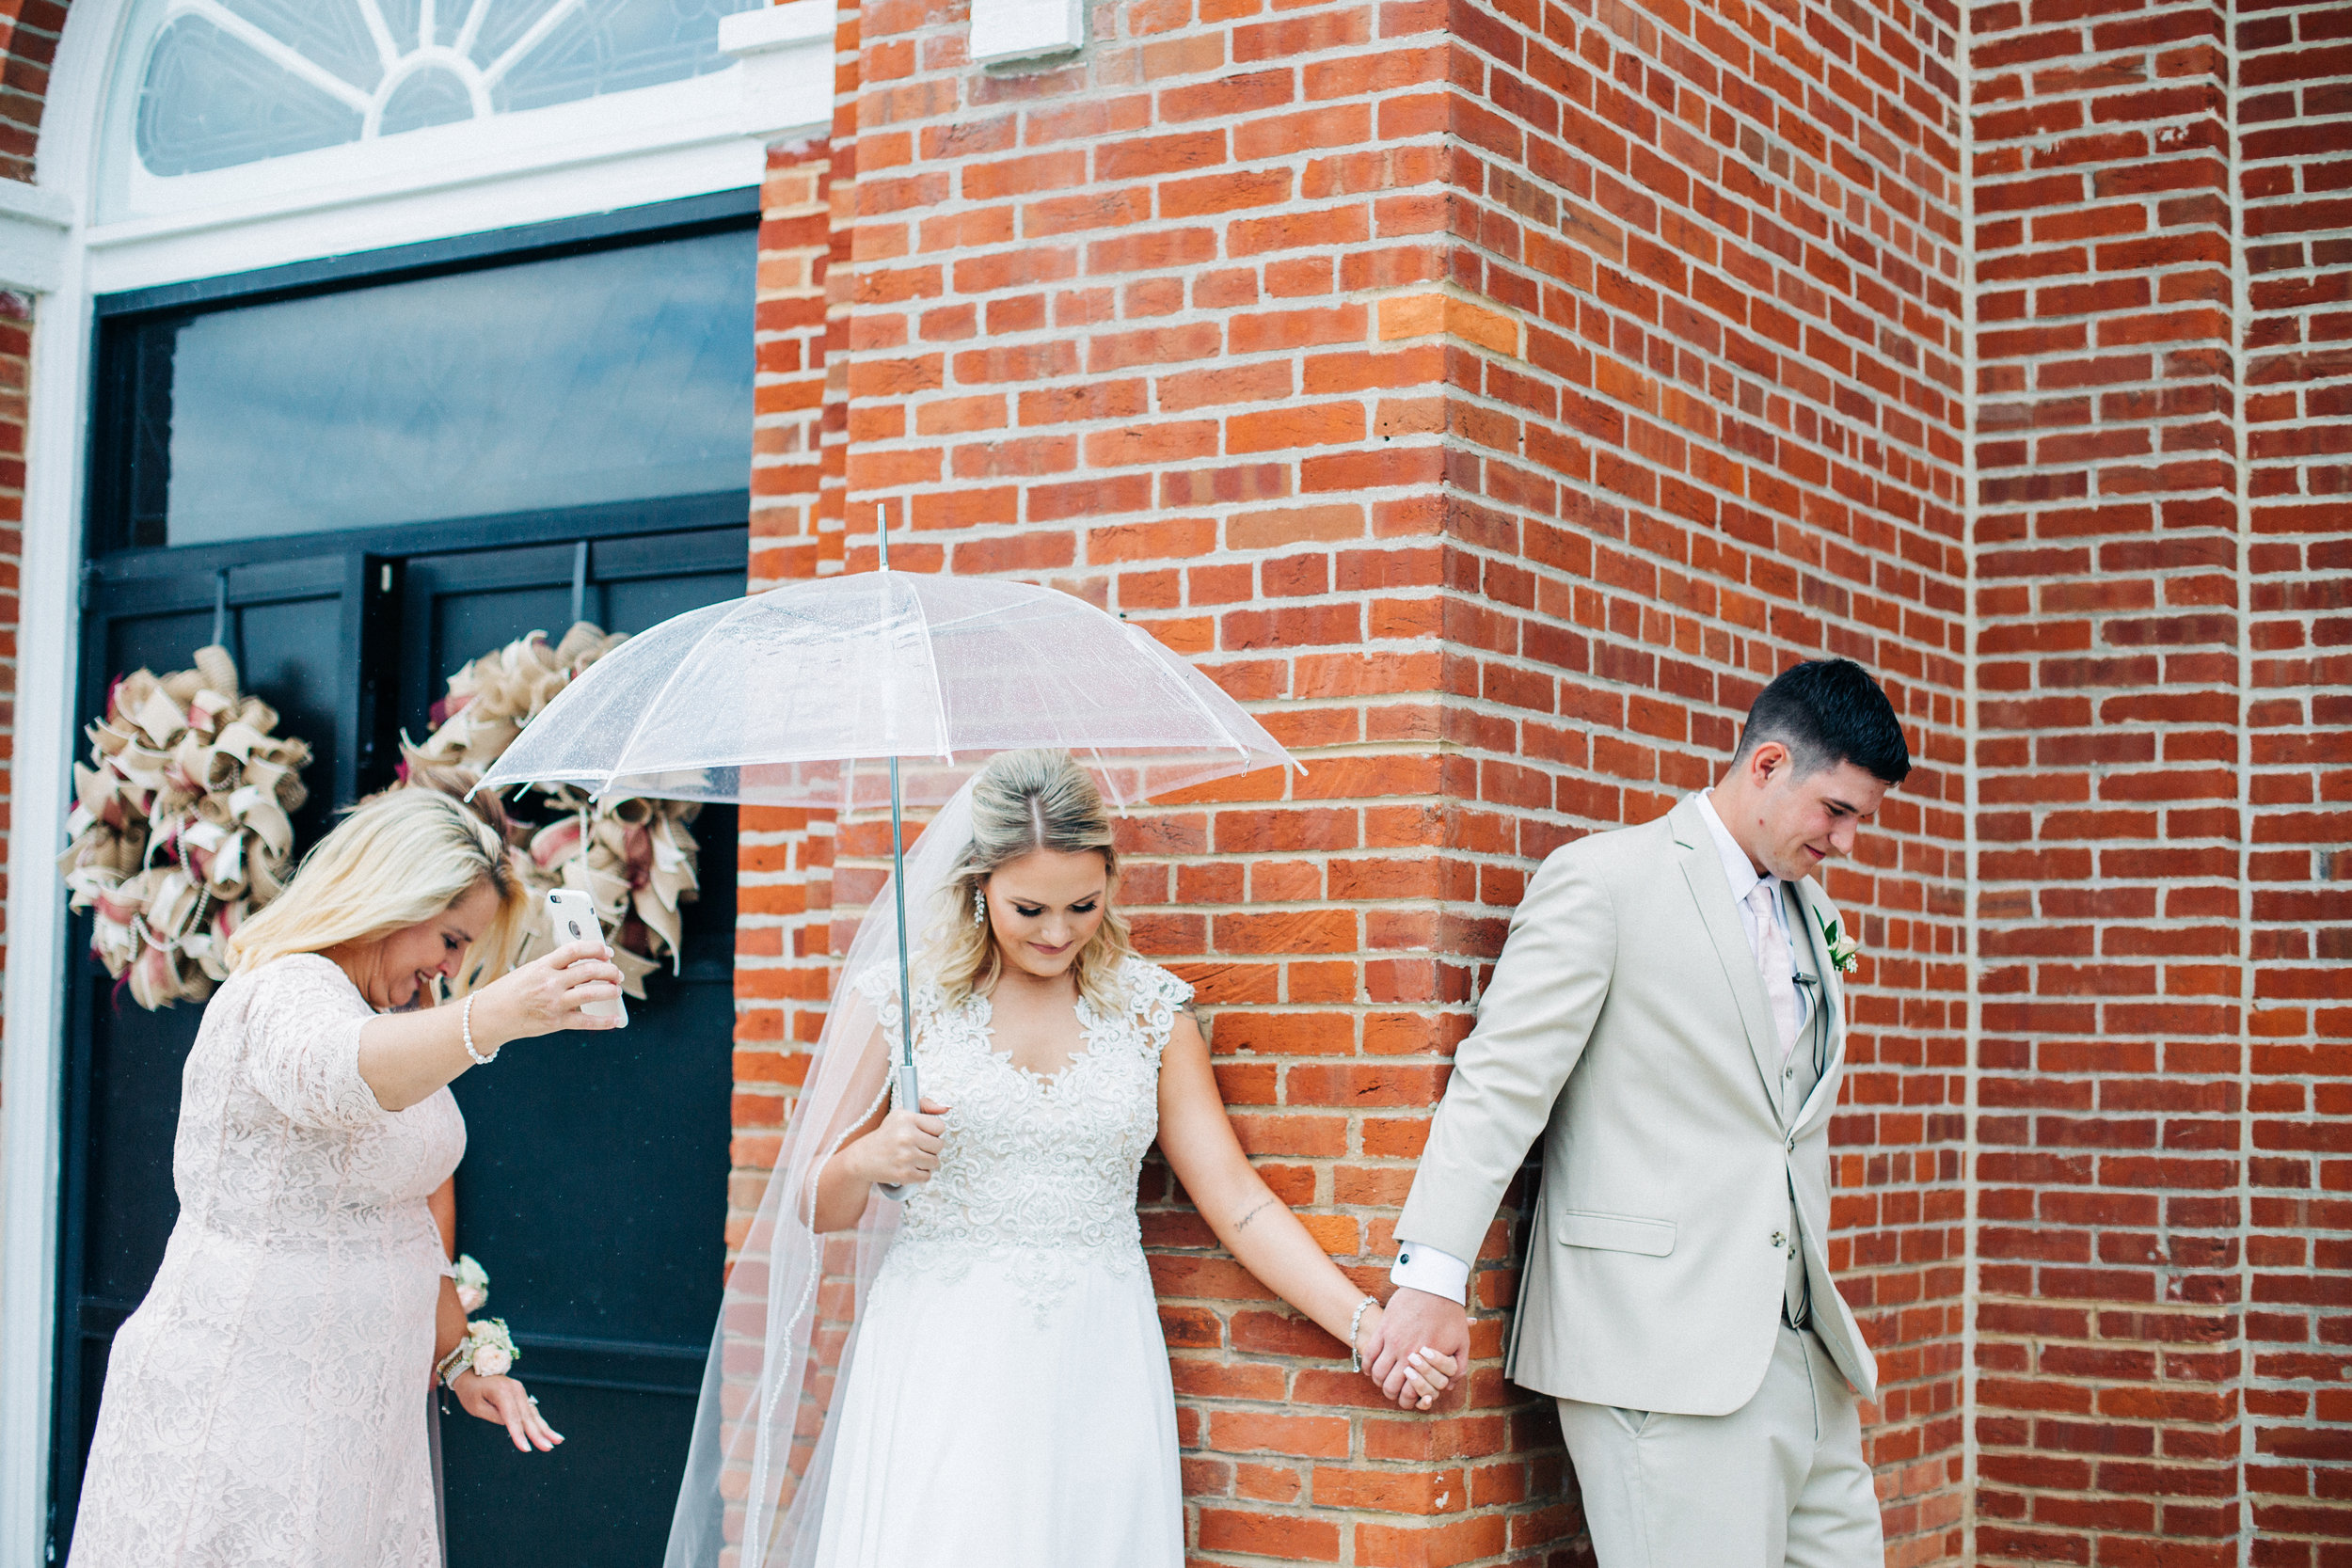 Dorothy_Louise_Photography_Marissa_Jake_Wentzville_MO_Wedding-140.jpg